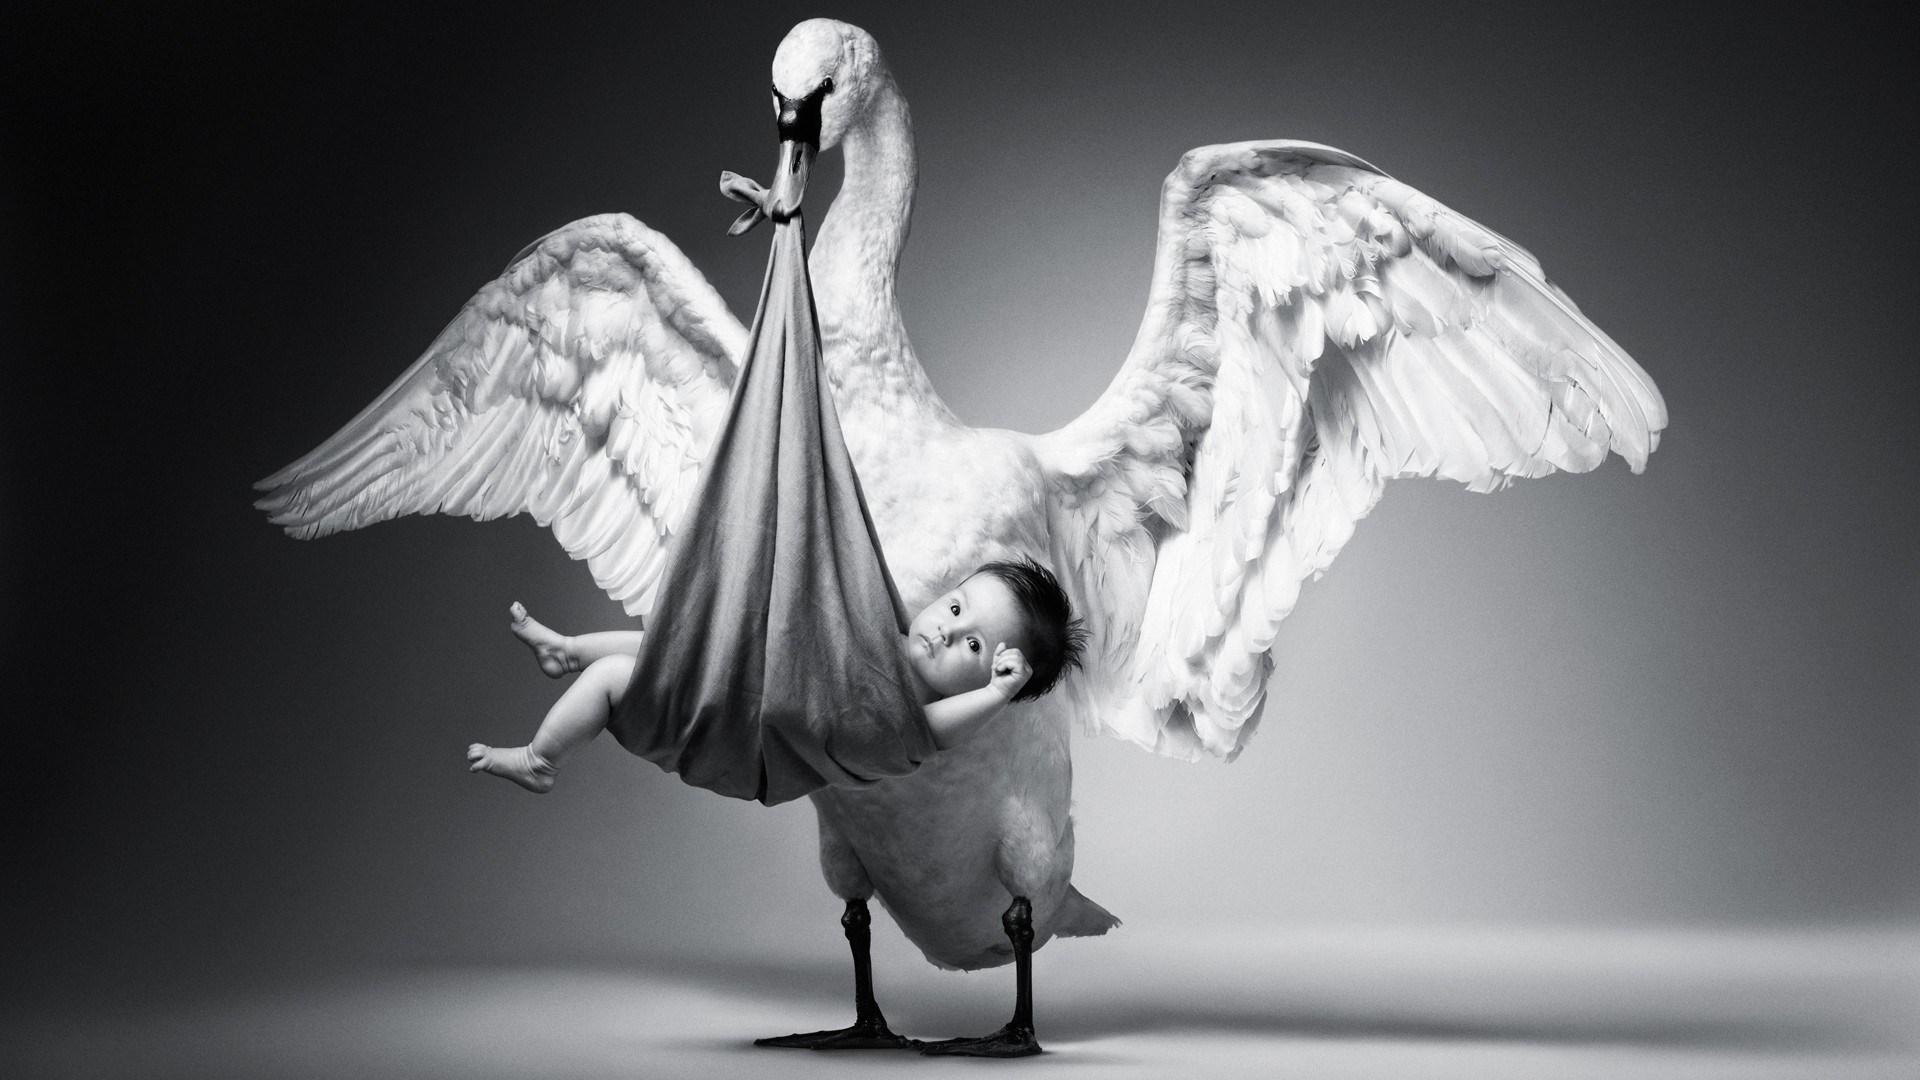 Cute Child White Swan Photo Funny